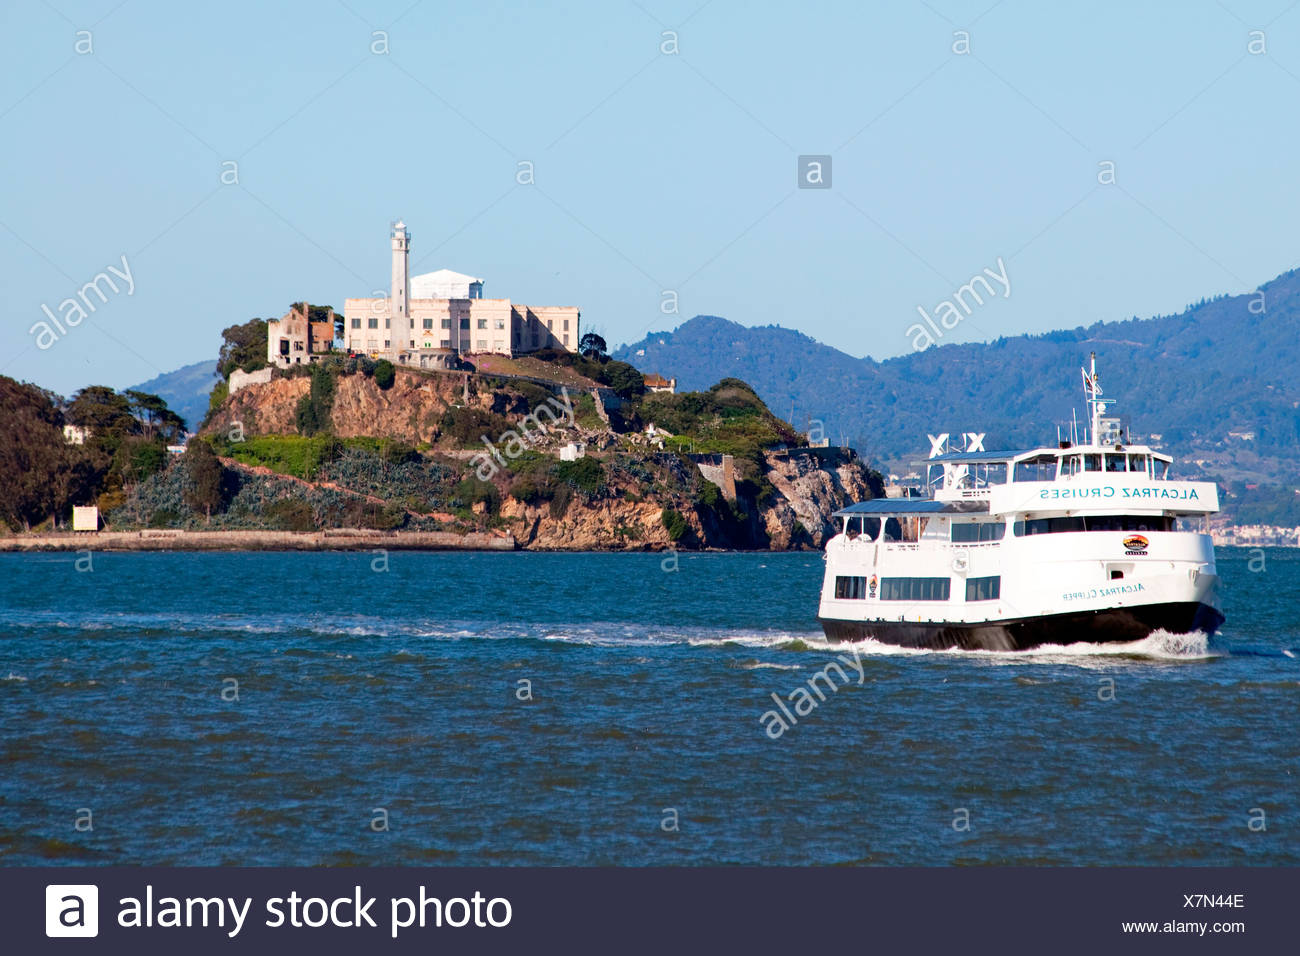 Alcatraz Cruises Ferry leaving Alcatraz Island for Pier 33 in San Francisco, CA - Stock Image